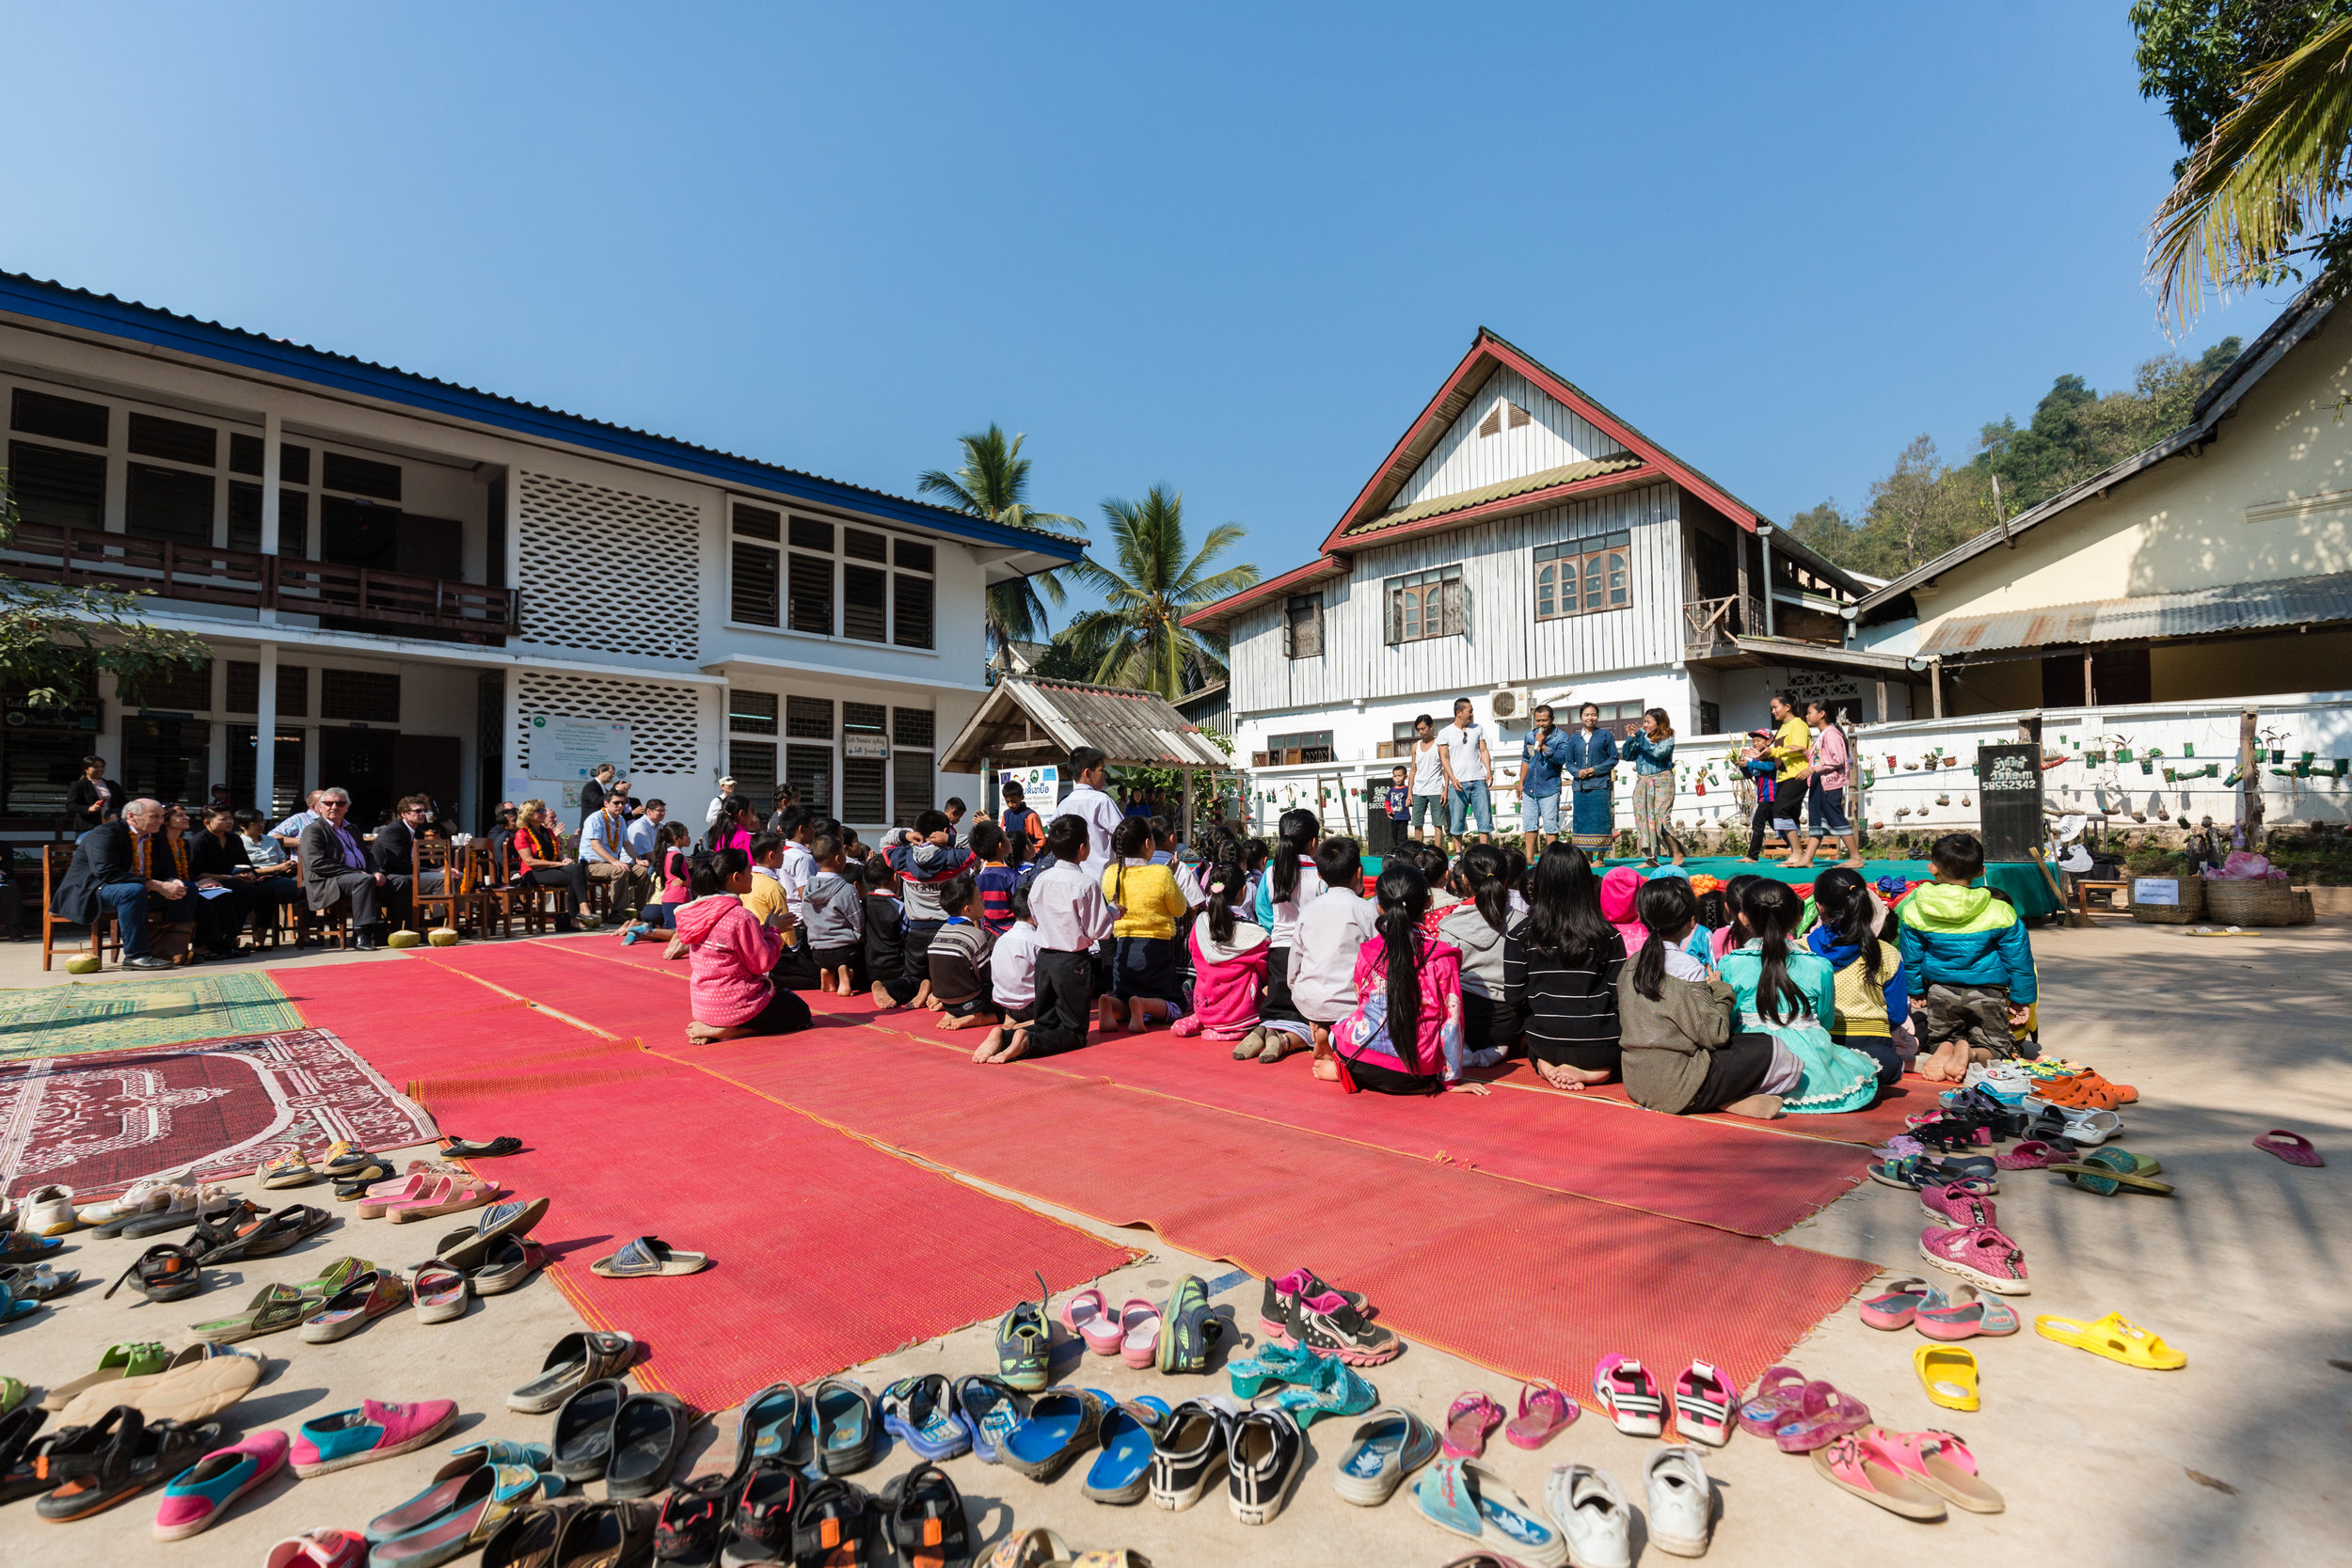 Laos-Luang-Prabang-GIZ-German-Parliament-waste-performance-Photo-by-Cyril-Eberle-CEB_2906.jpg